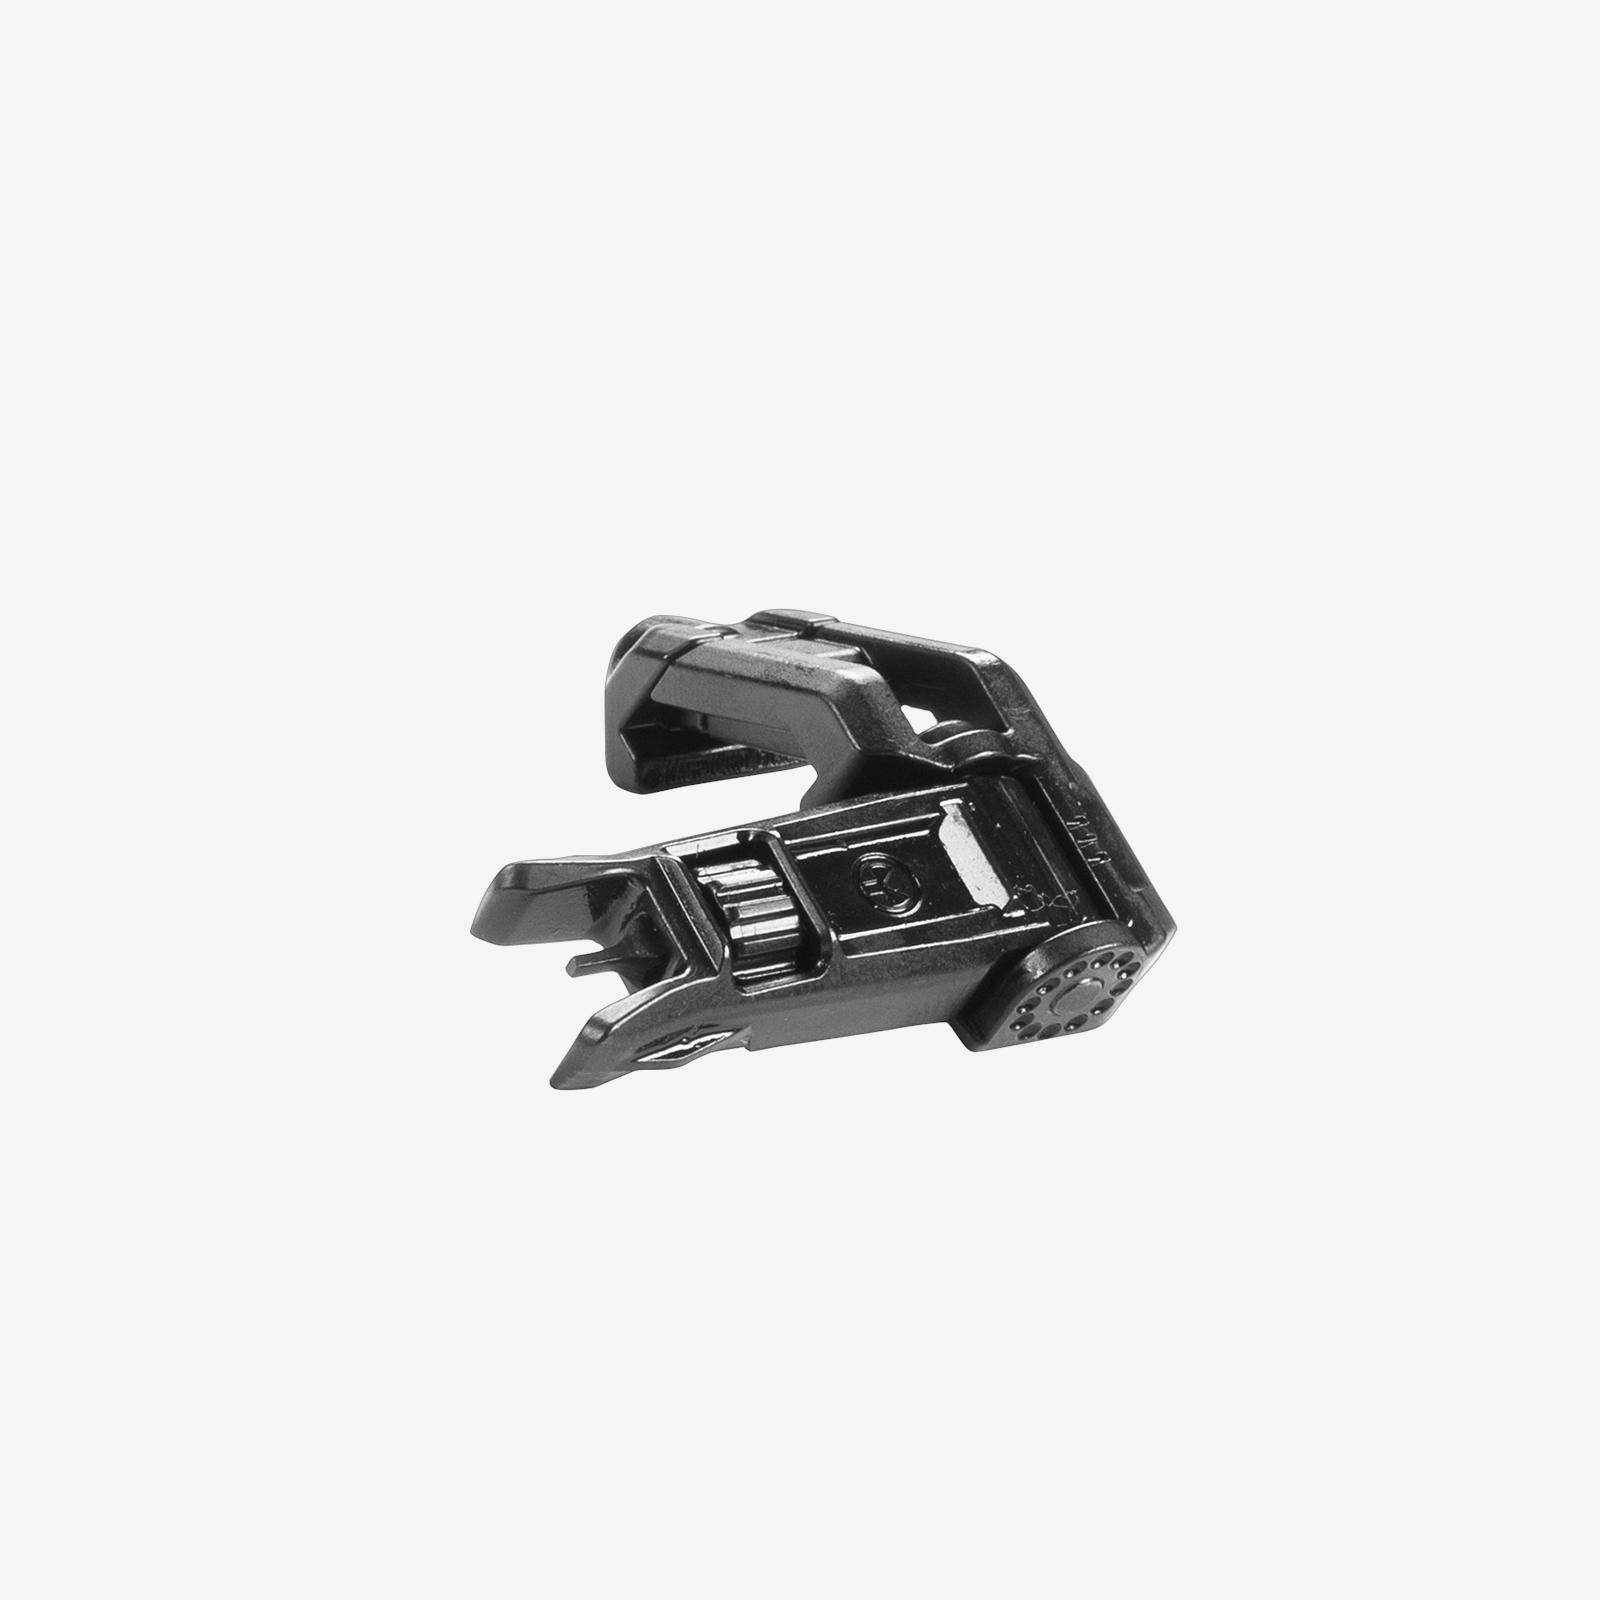 Мушка складная сбоку от планки Weaver MBUS®ProOffsetSight-Front